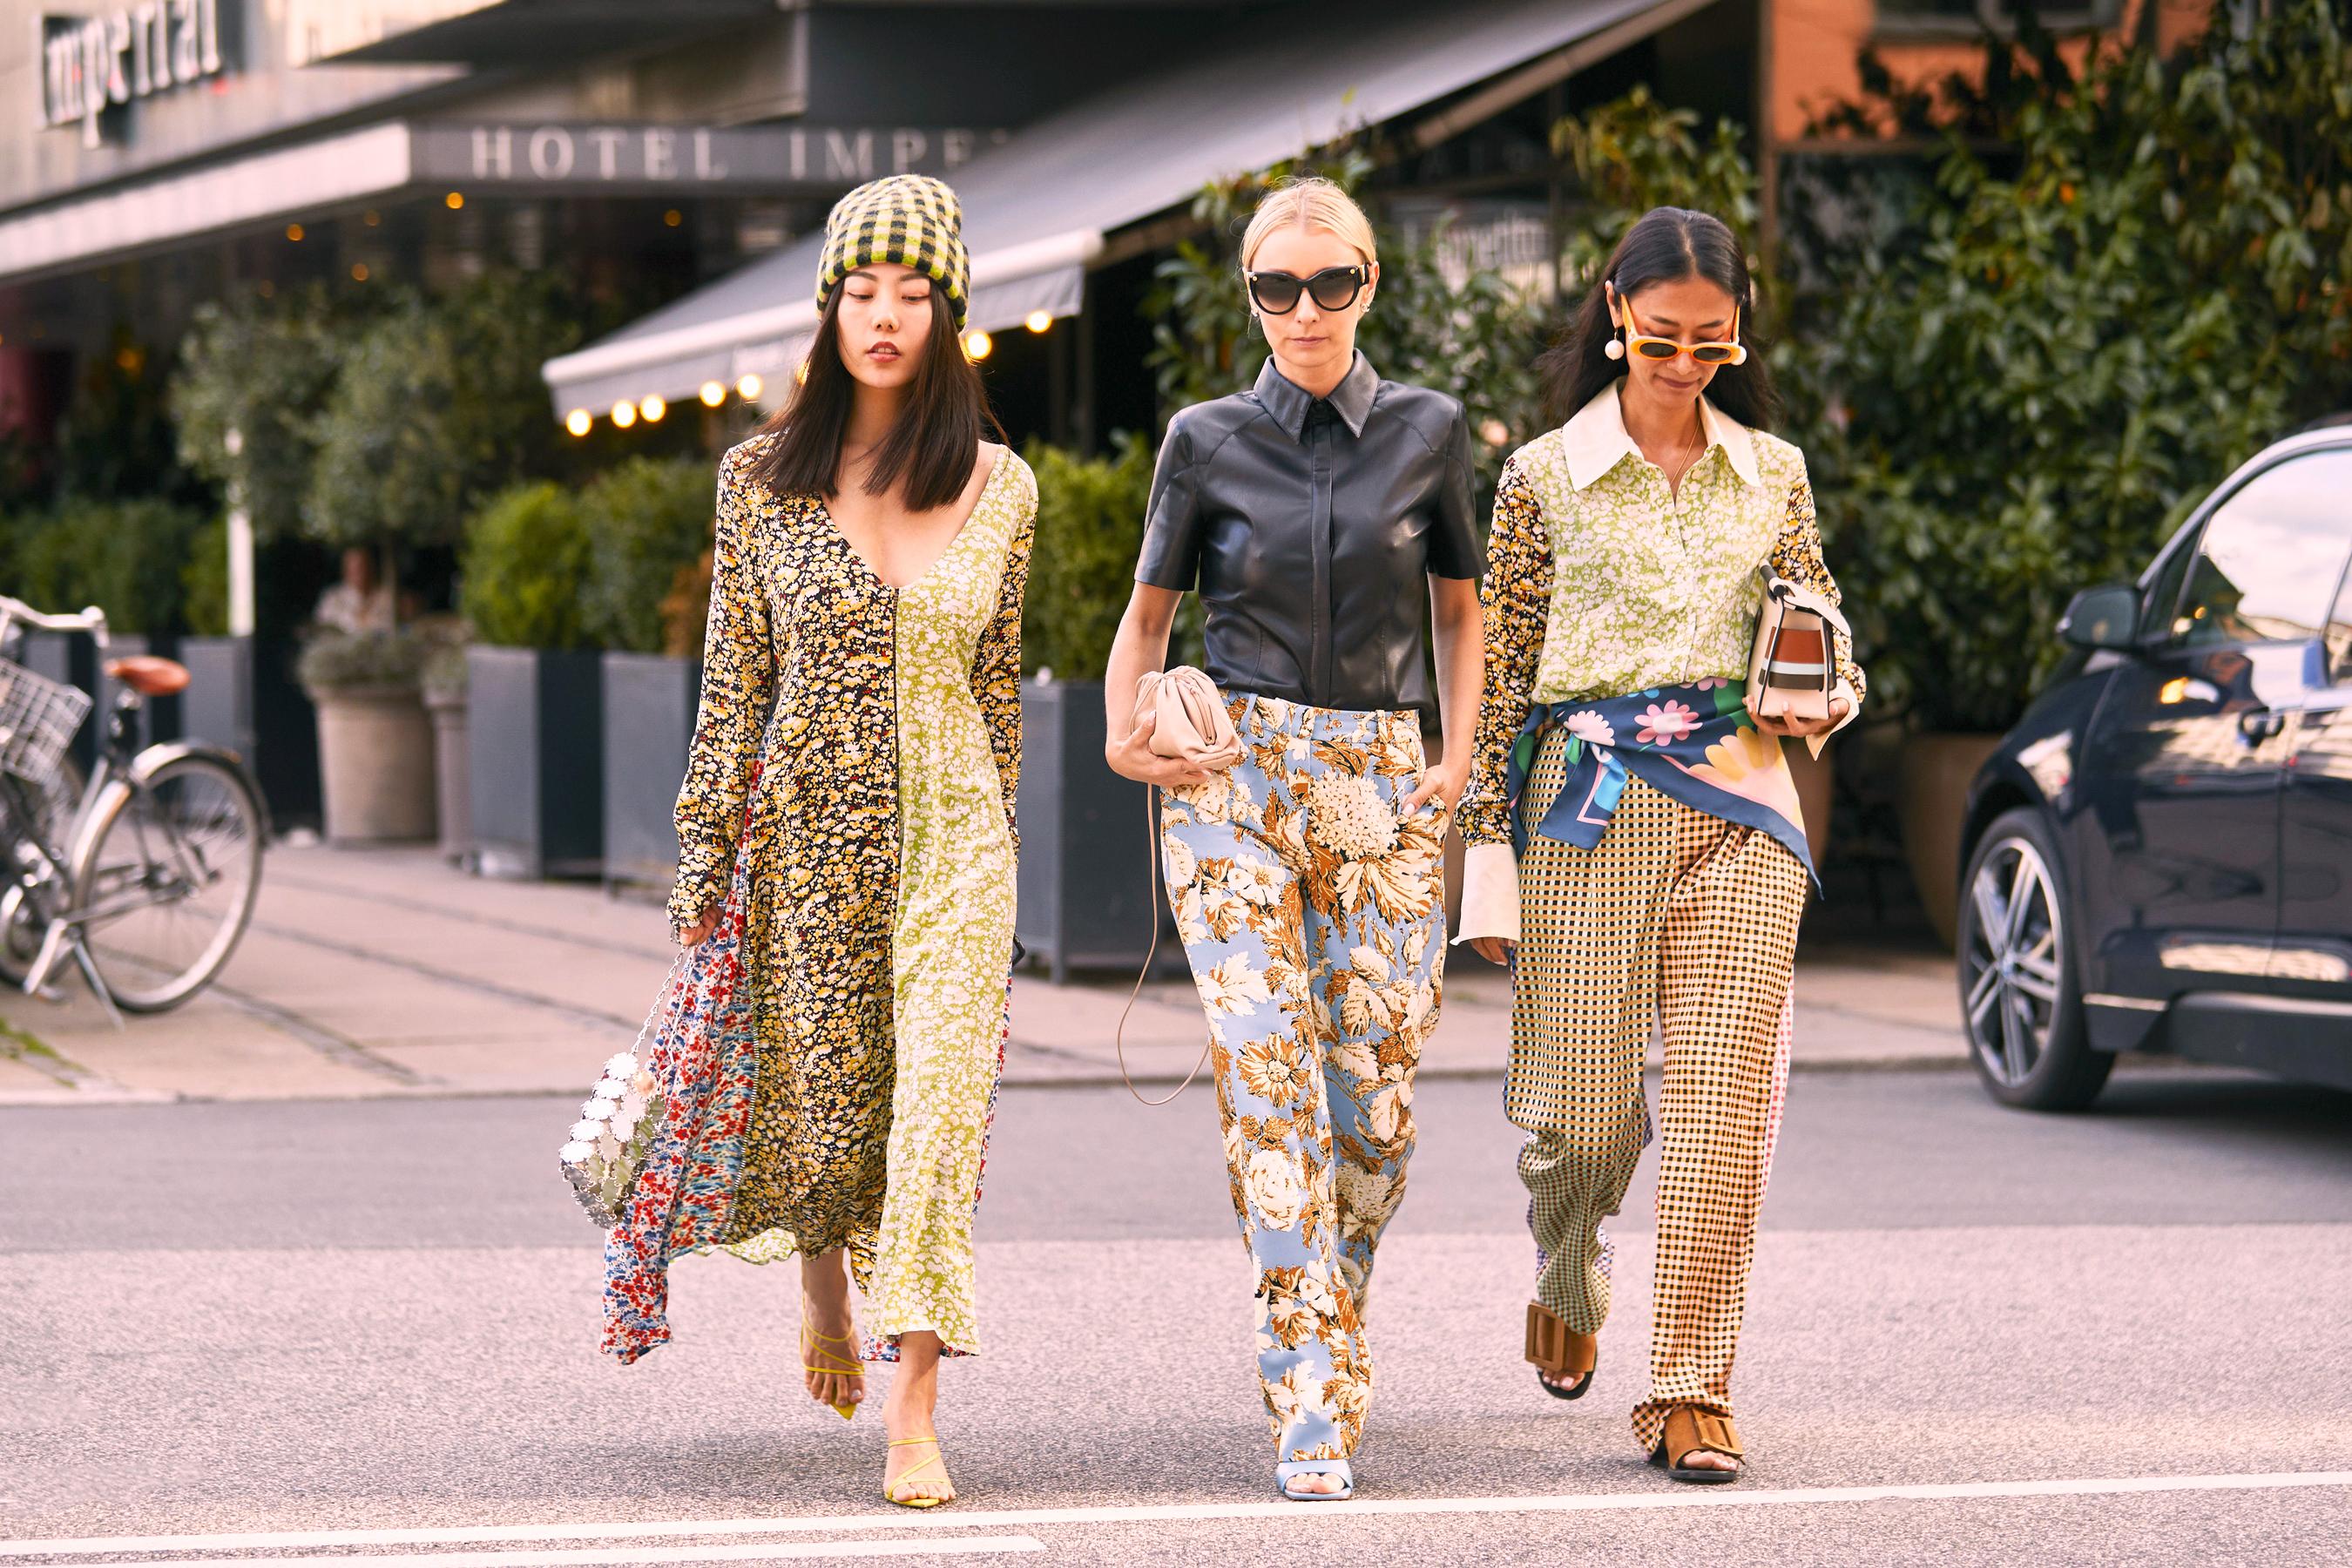 Street Fashion 2020.Copenhagen Fashion Week Street Style Spring 2020 Day 3 The